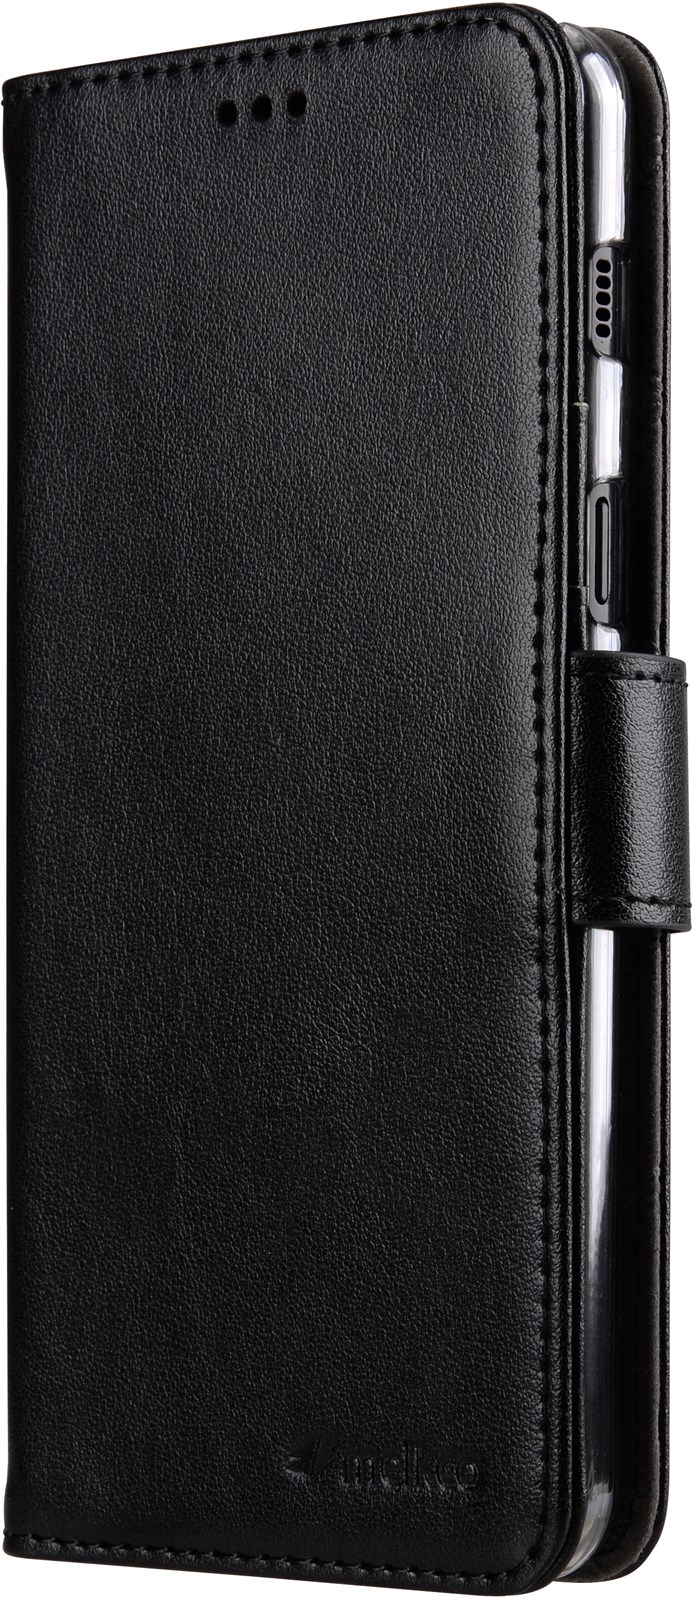 Melkco Walletcase Samsung Galaxy A6 (2018) Black